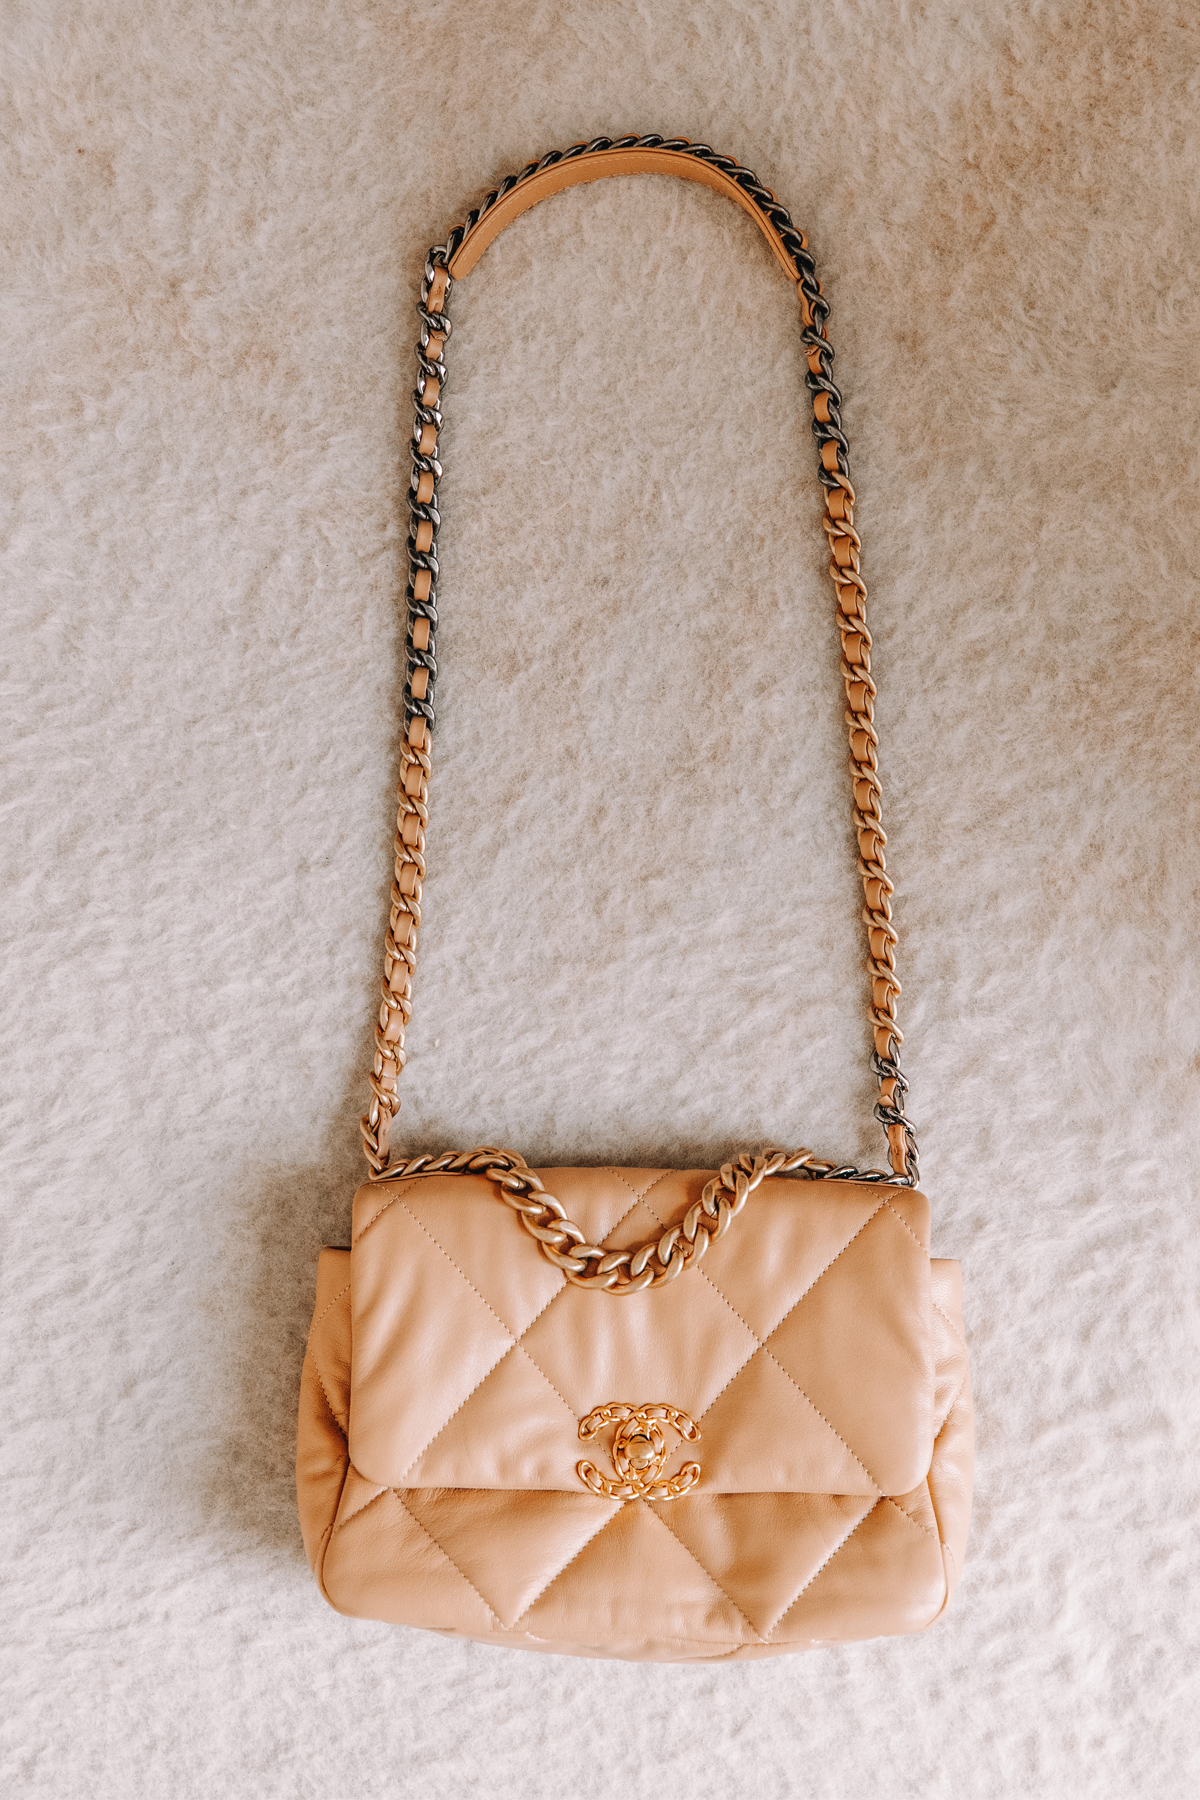 Fashion Jackson Chanel 19 Classic Small Dark Beige Handbag 2